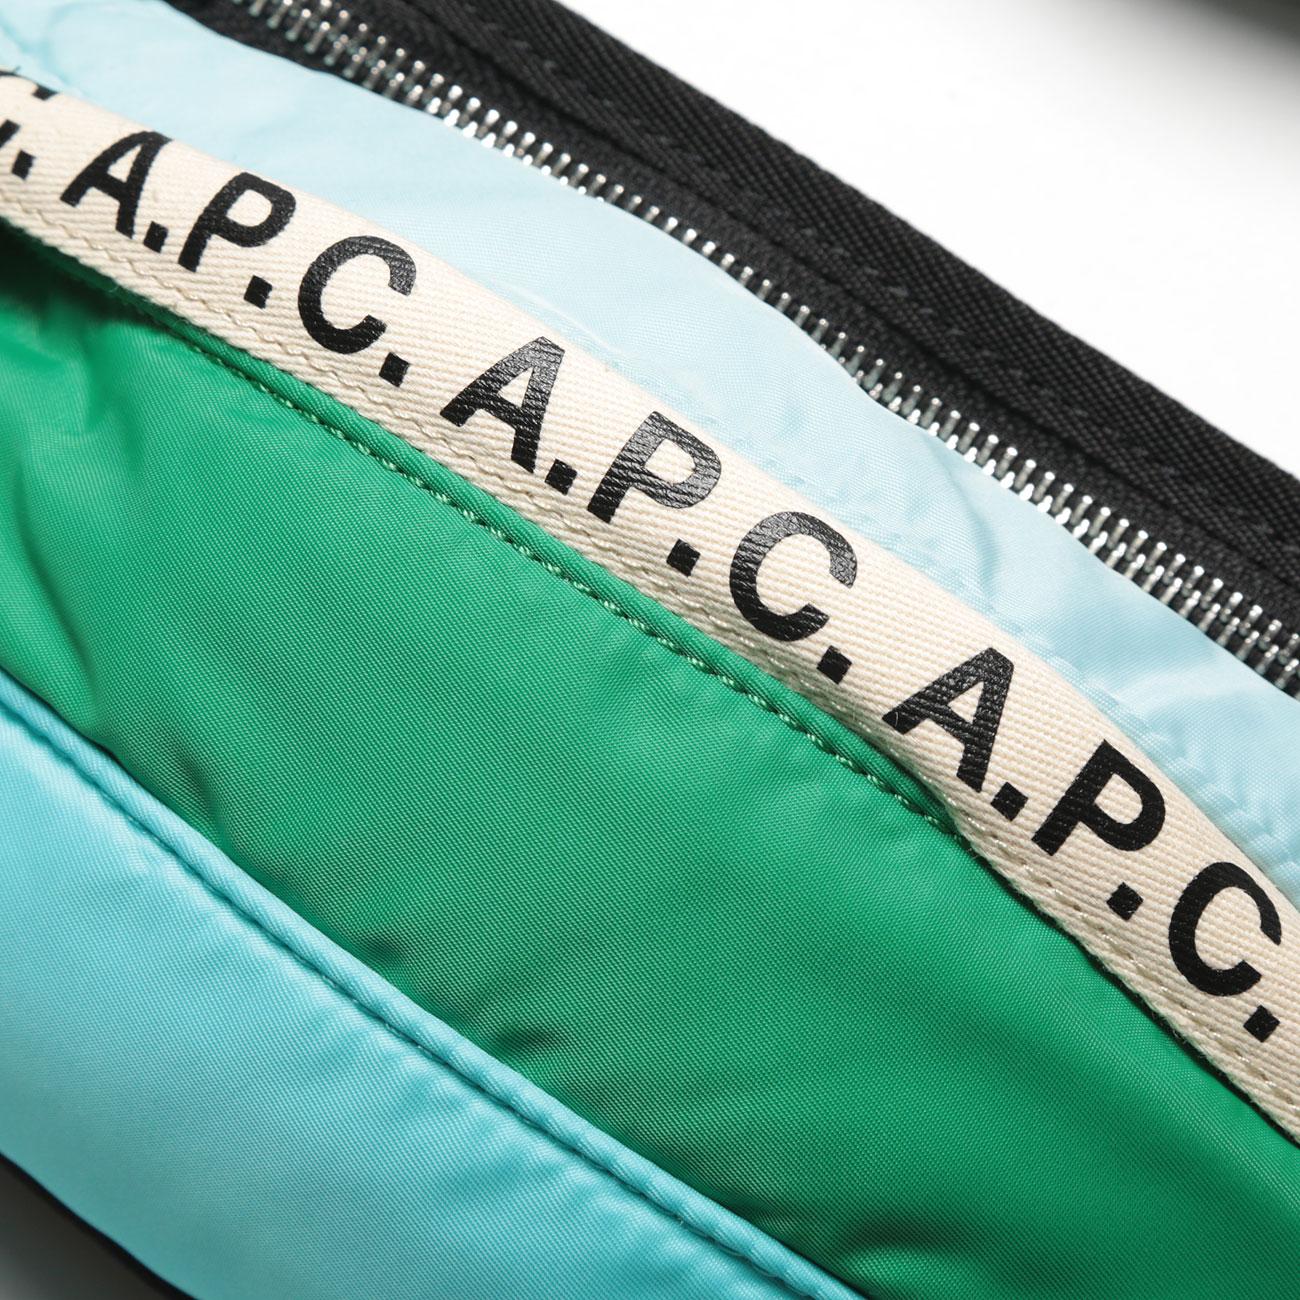 A.P.C. / アーペーセー Repeat ヒップバッグ - Green